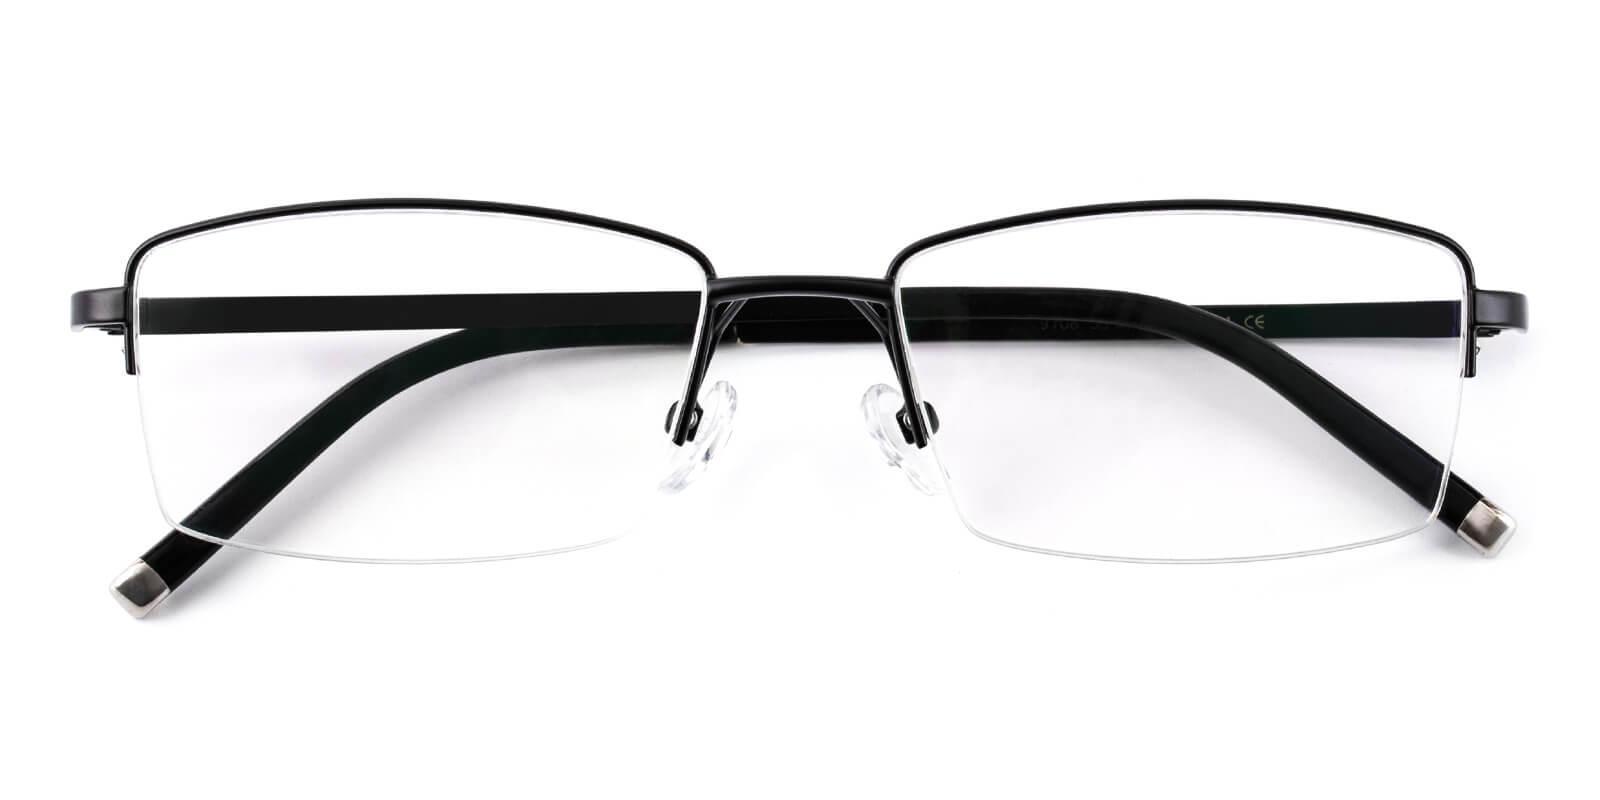 Emerge-Black-Rectangle-Titanium-Eyeglasses-detail